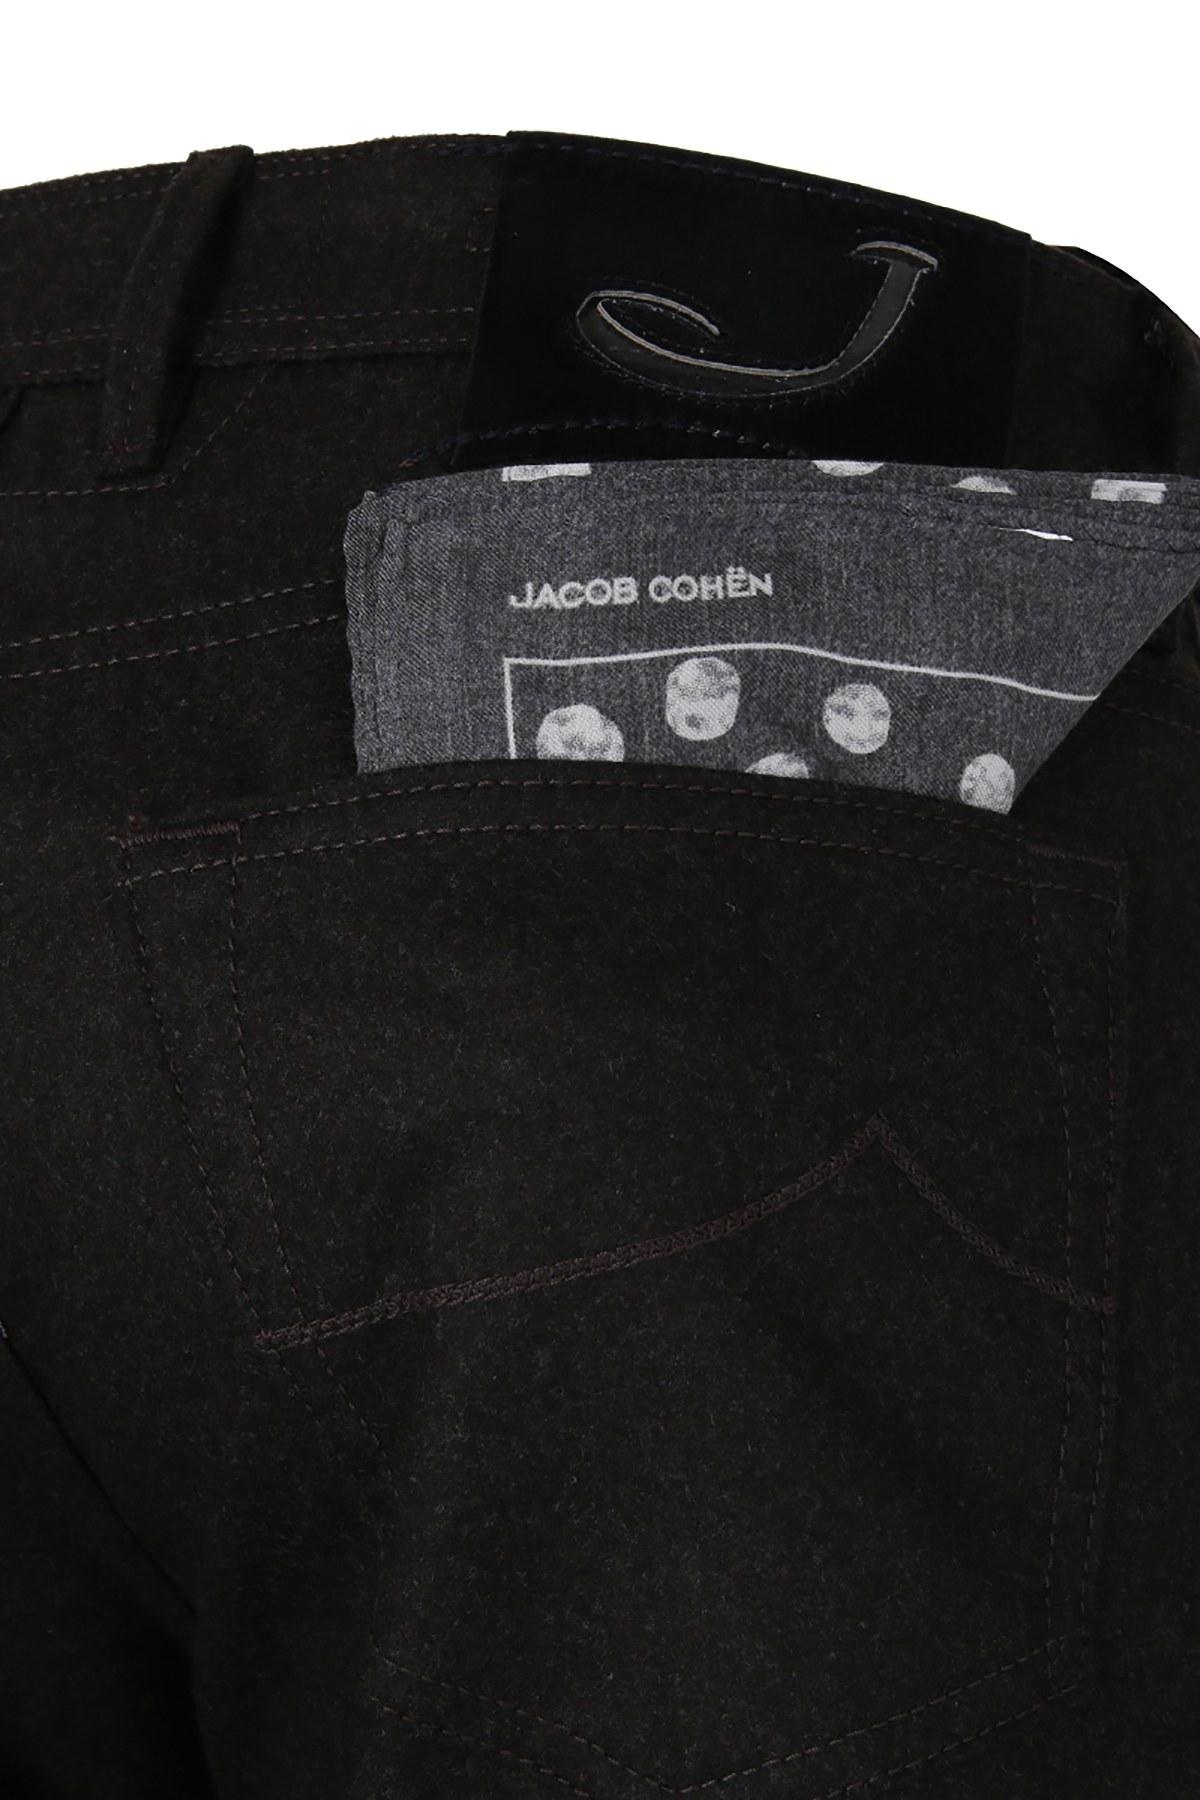 JACOB COHEN JEANS Erkek Pamuklu Pantolon J622WOOLBCOMF06968N KAHVE